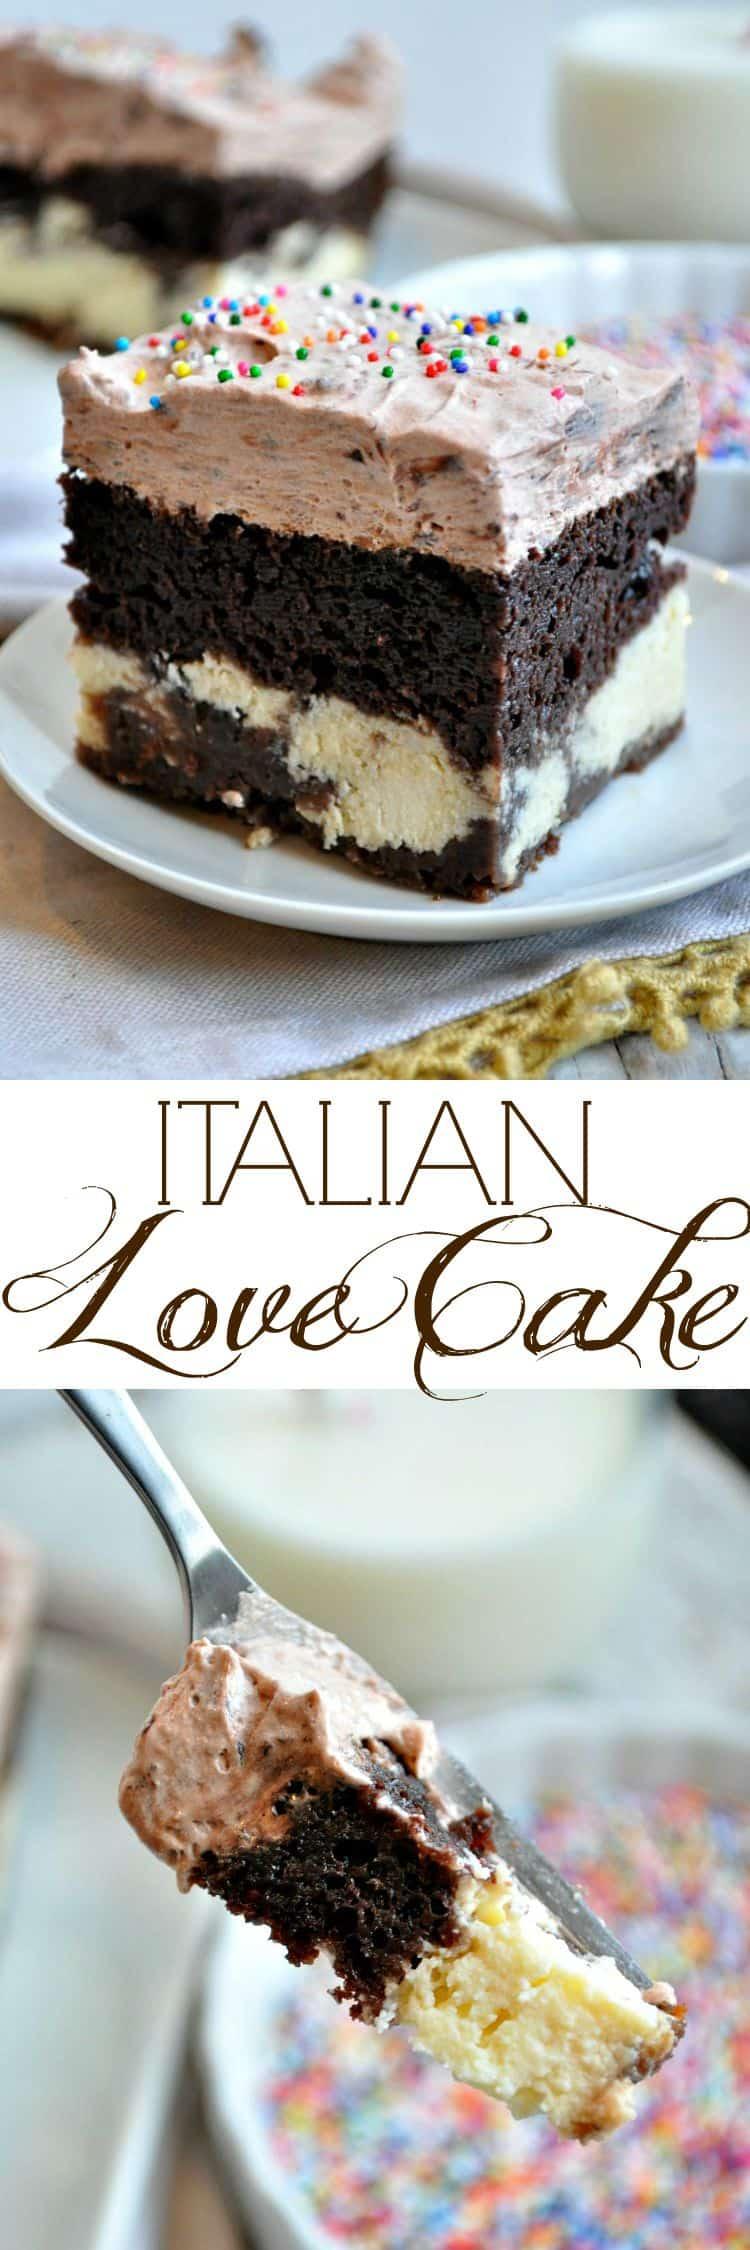 Chocolate Love Cake Images : Easy Chocolate Italian Love Cake - The Seasoned Mom